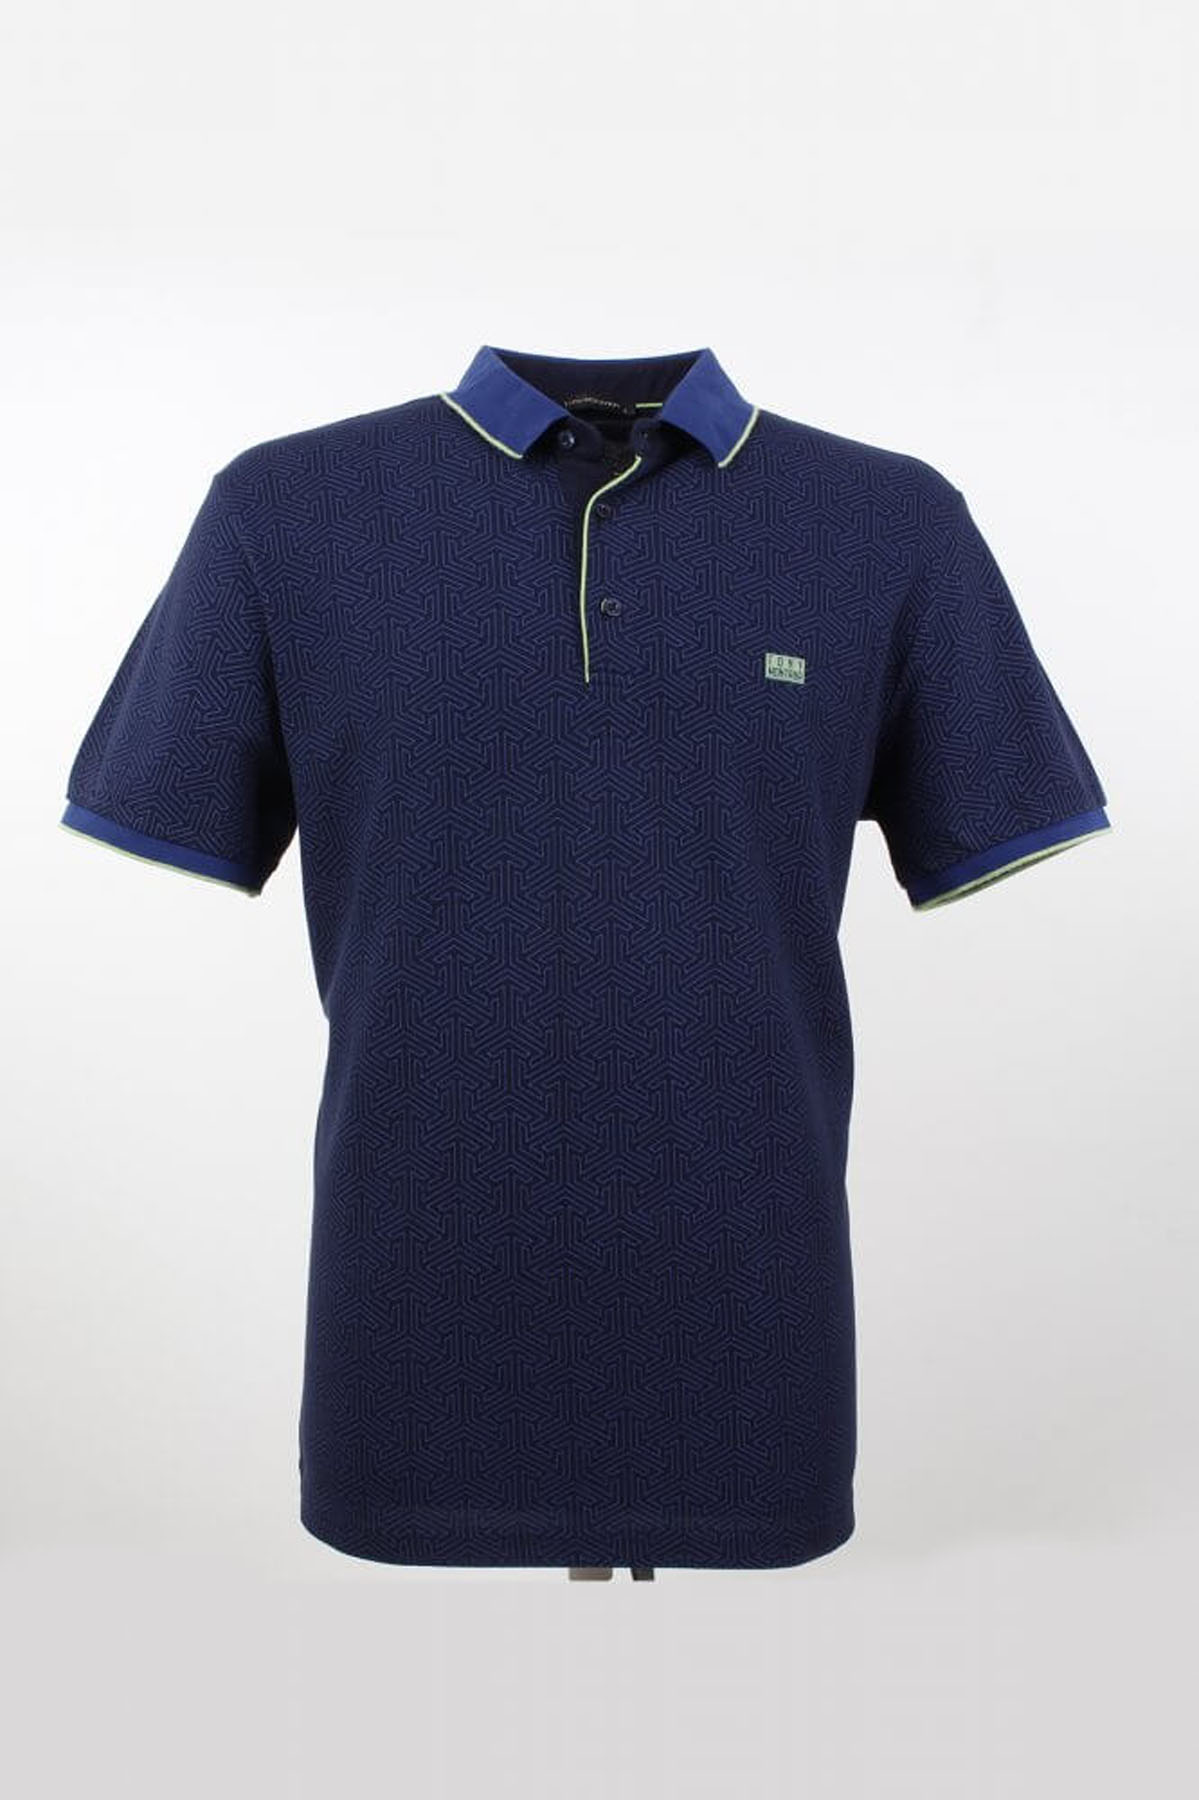 Polo Yaka Çizgi Detaylı Lacivert T-Shirt